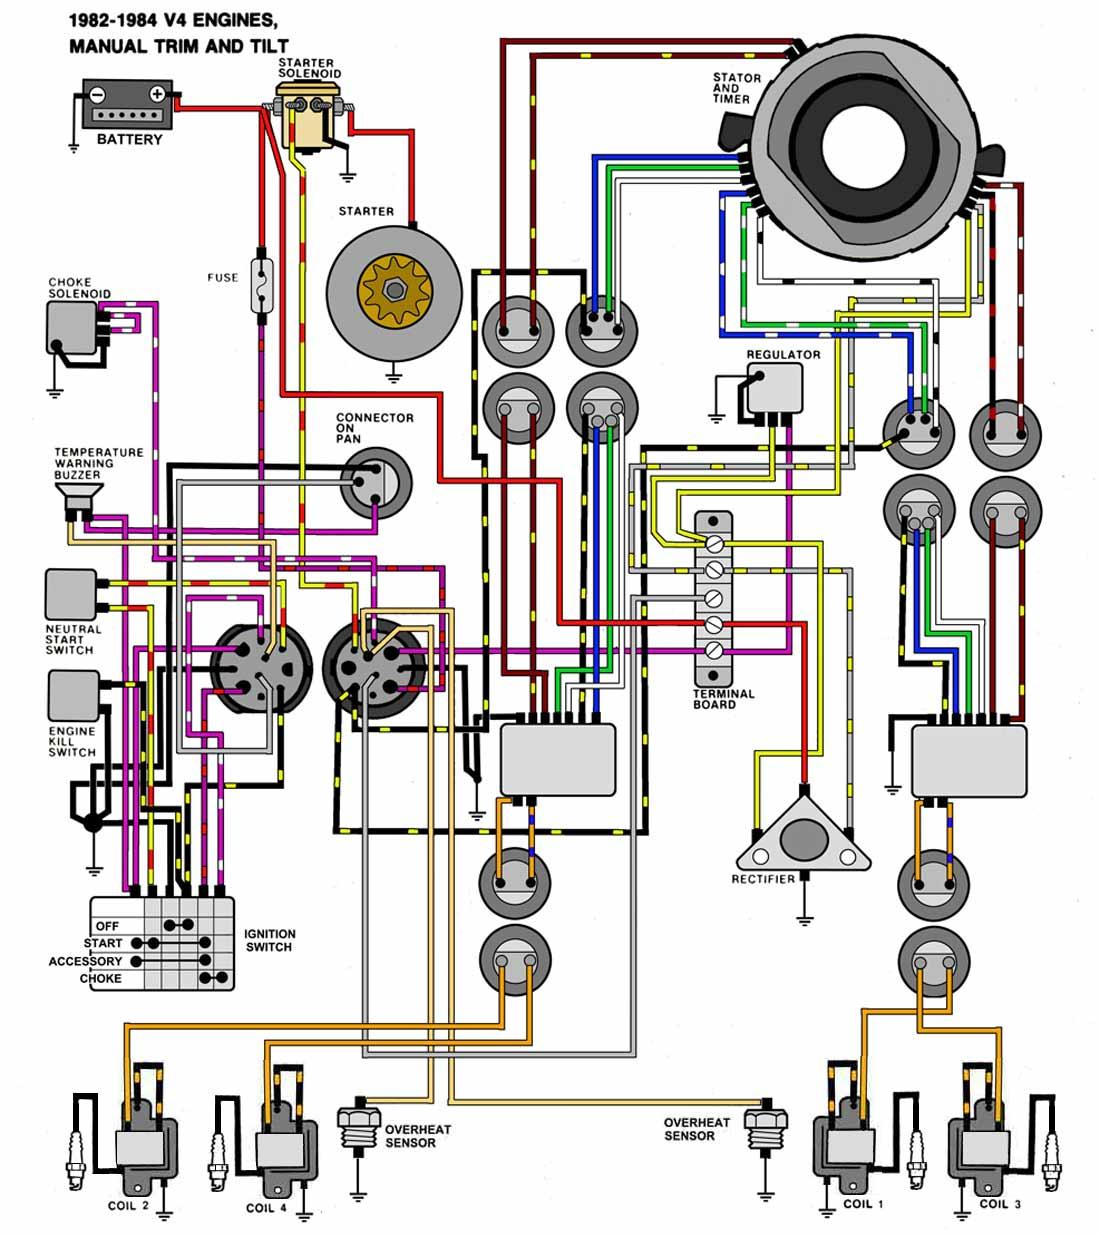 Wiring Diagram Johnson Outboard Motor Automotivegarage Org 1987 50Hp  Johnson Wiring-Diagram 1991 Johnson 25 Hp Wiring Diagram